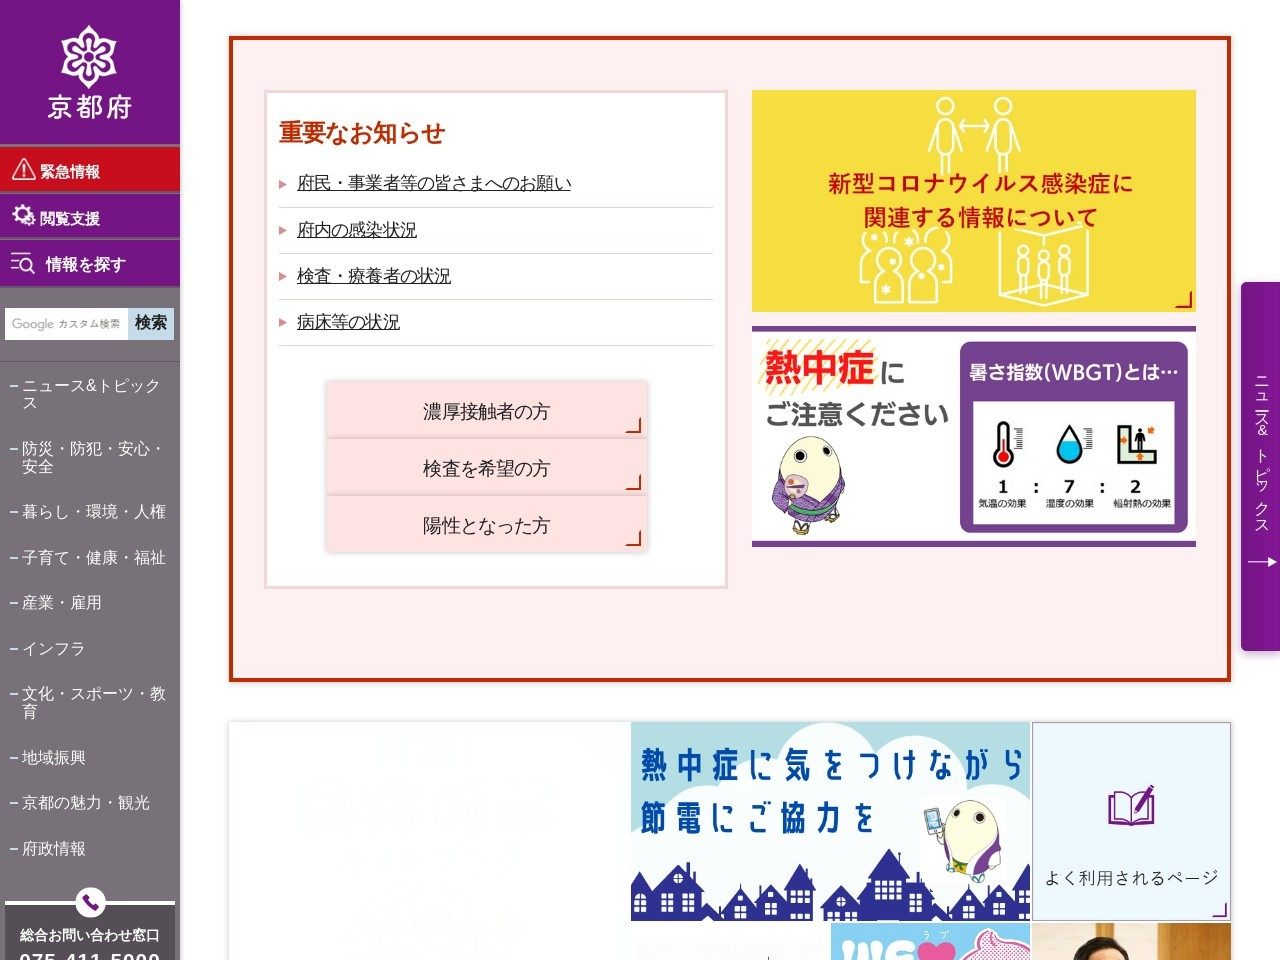 http://www.pref.kyoto.jp/index.html